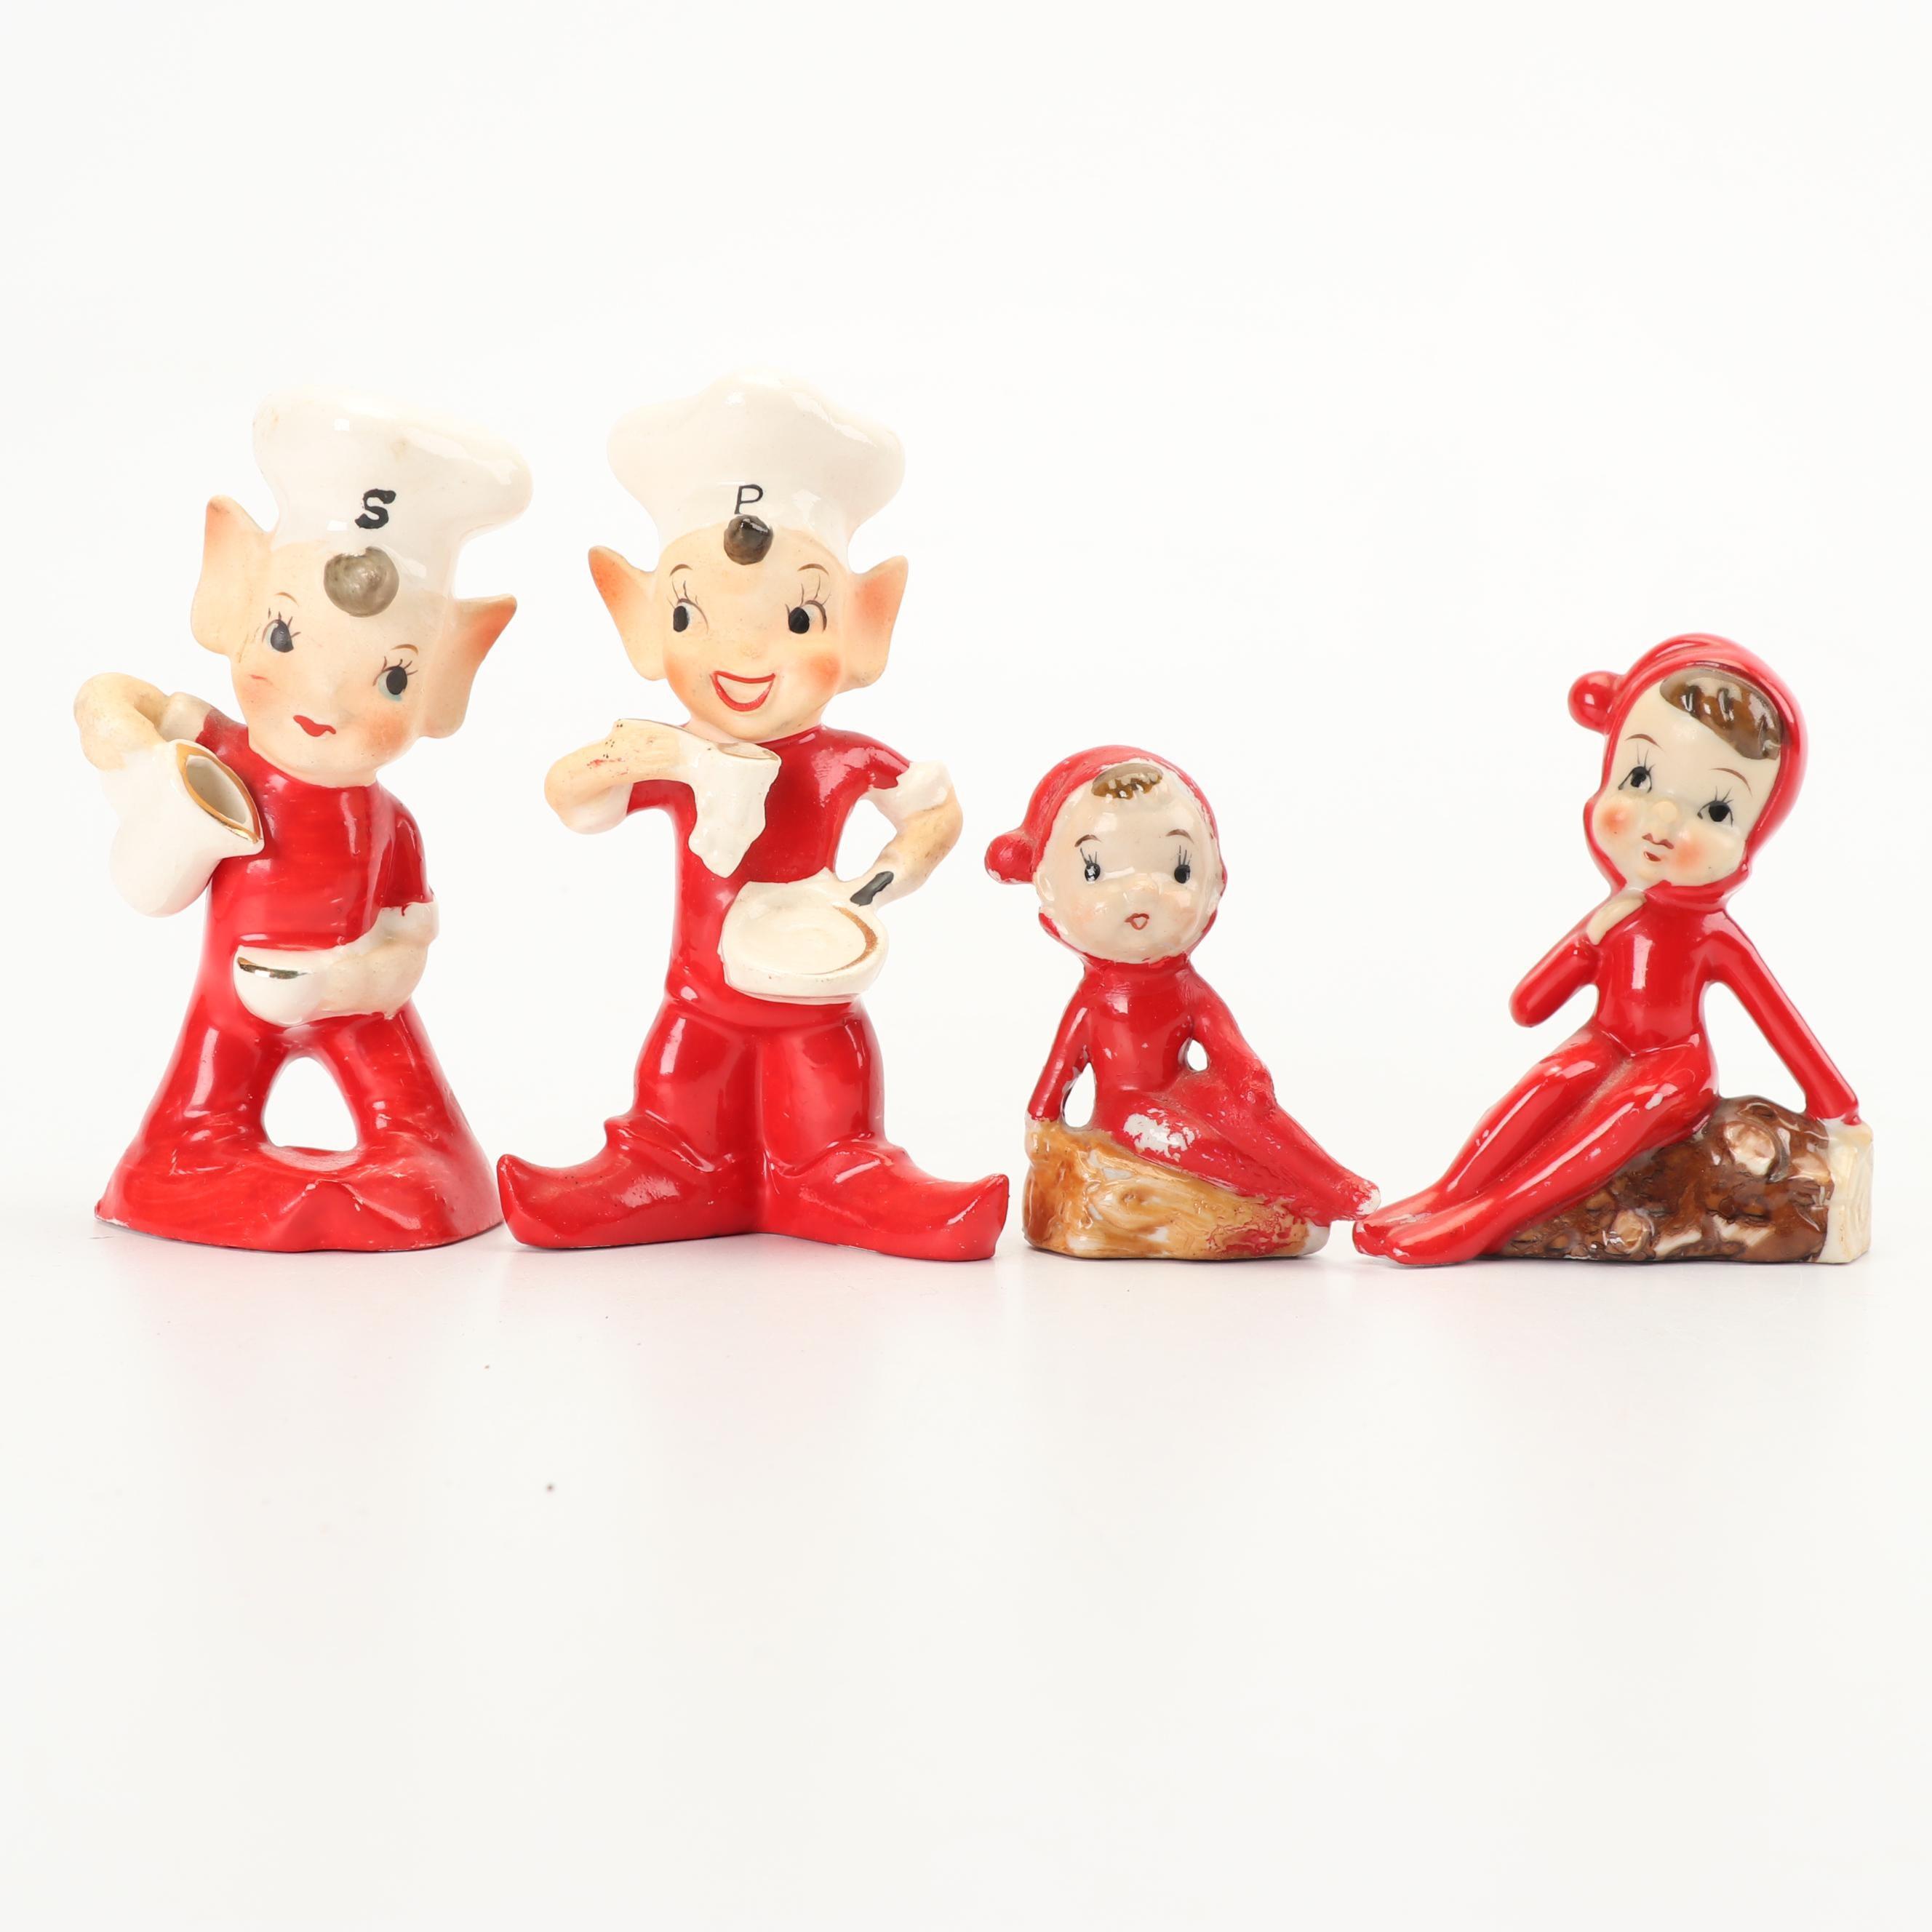 Ceramic Pixie Figurines with Salt and Pepper Set, Mid Century